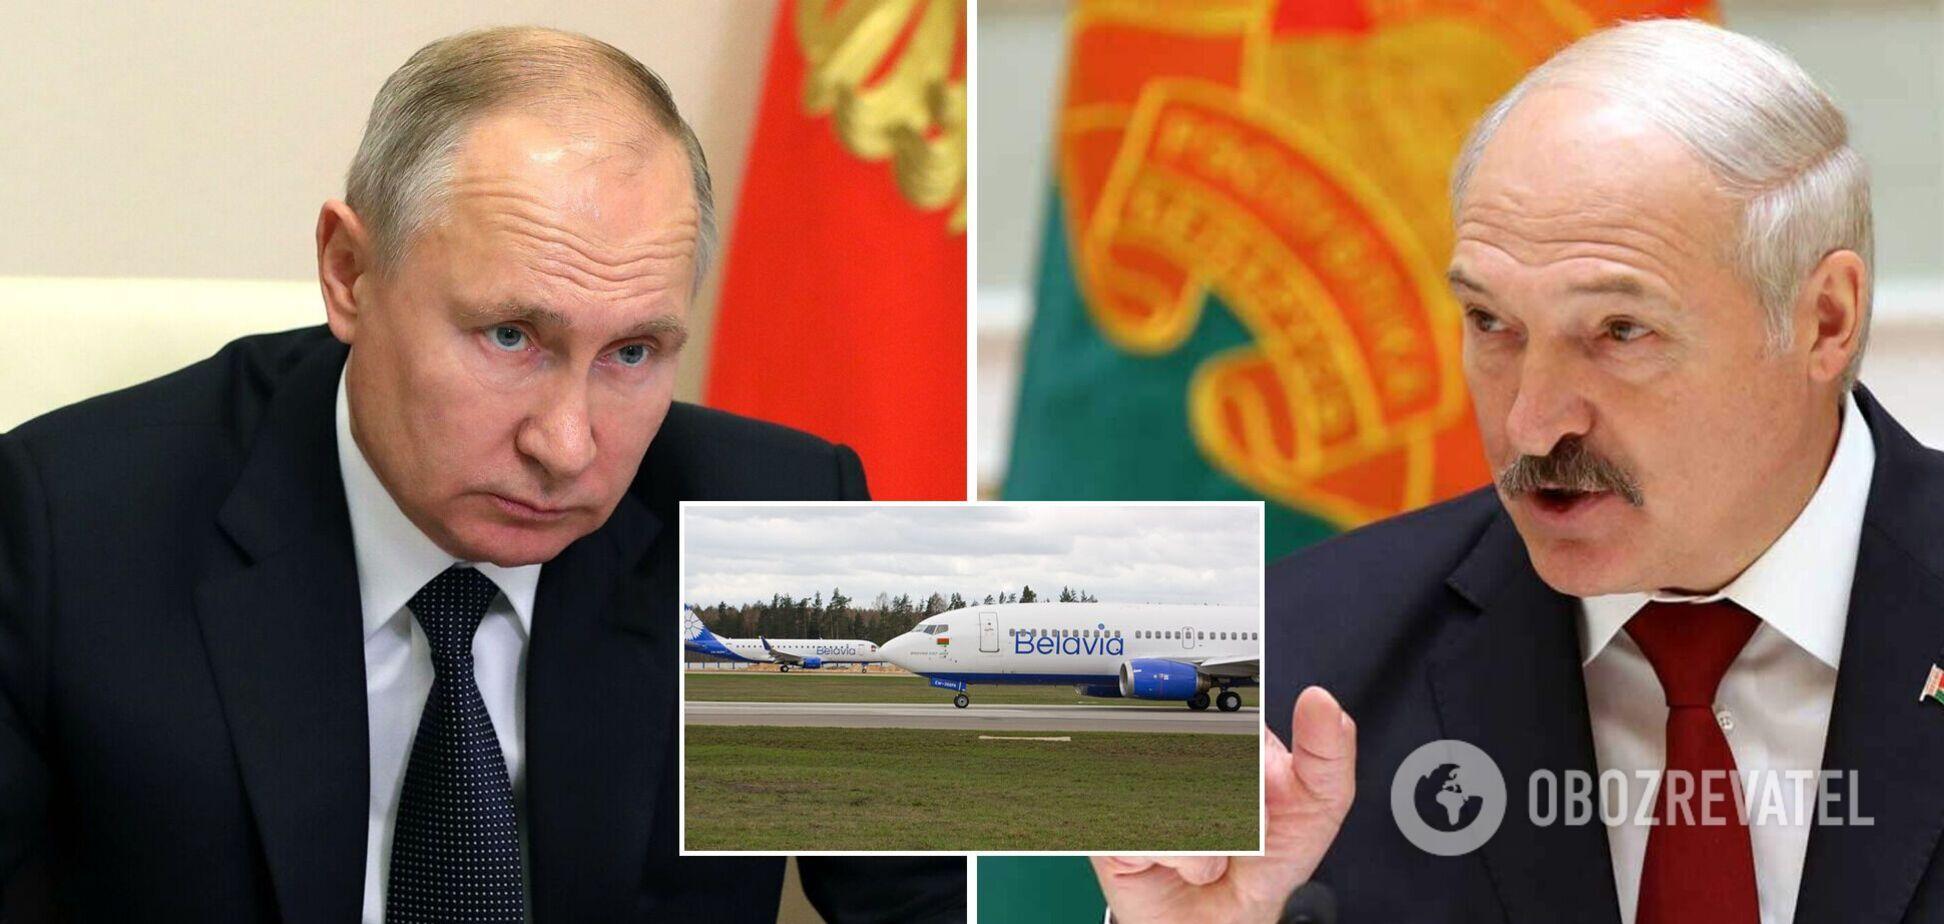 Лукашенко – Путину о запрете полетов 'Белавиа' в ЕС: замочили на всю катушку. Видео